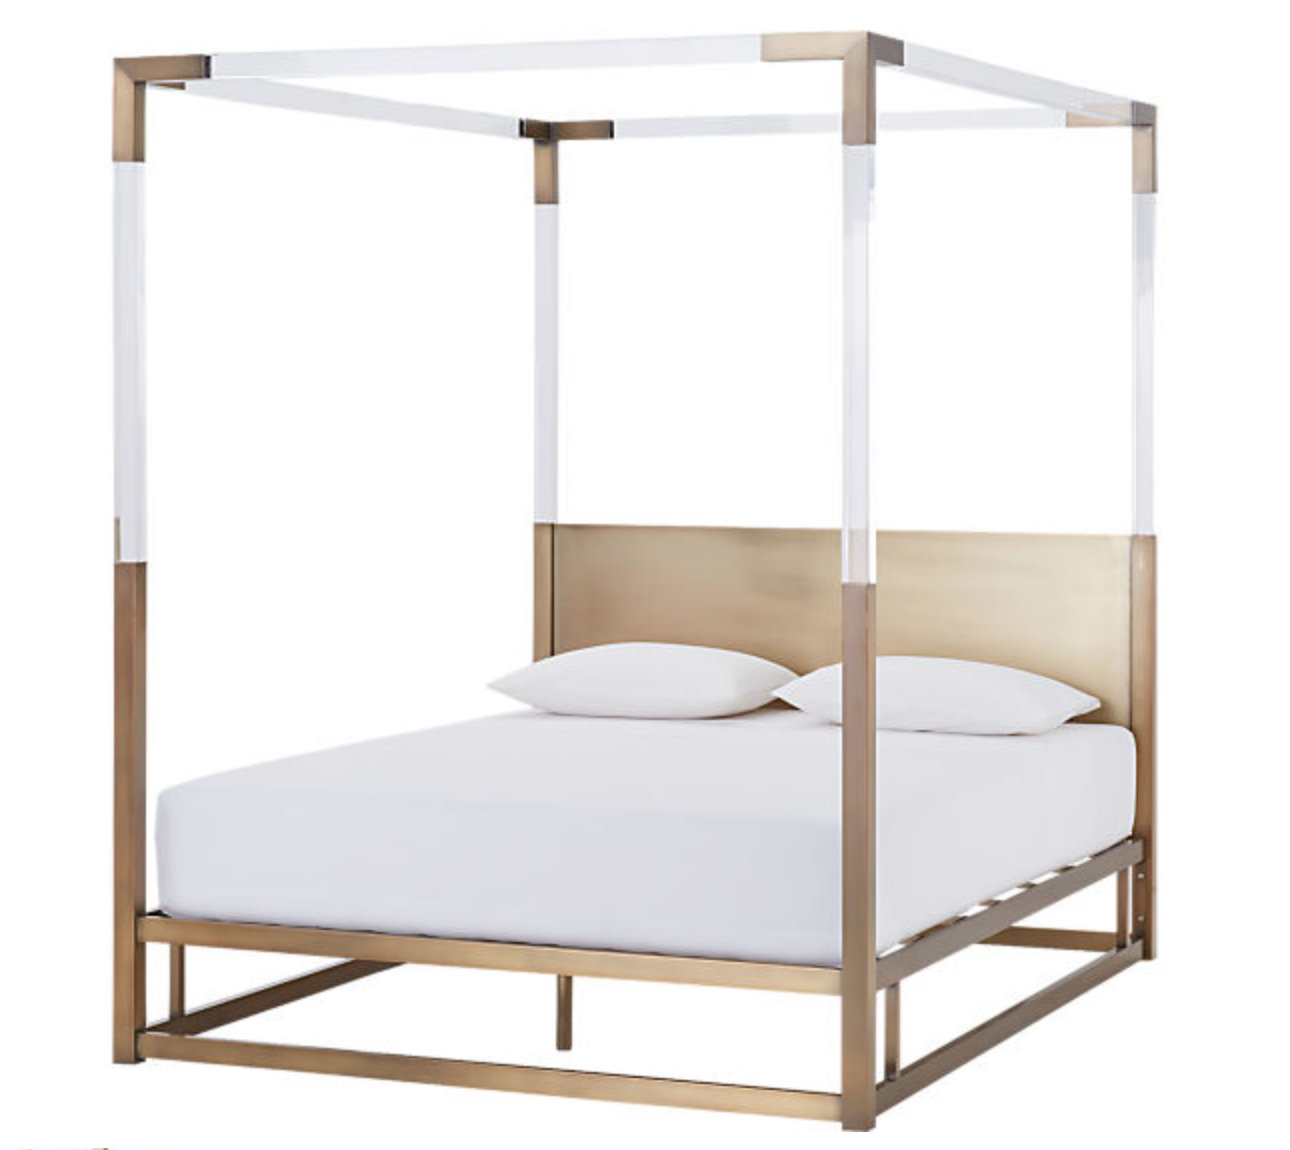 Acrylic Canopy Bed